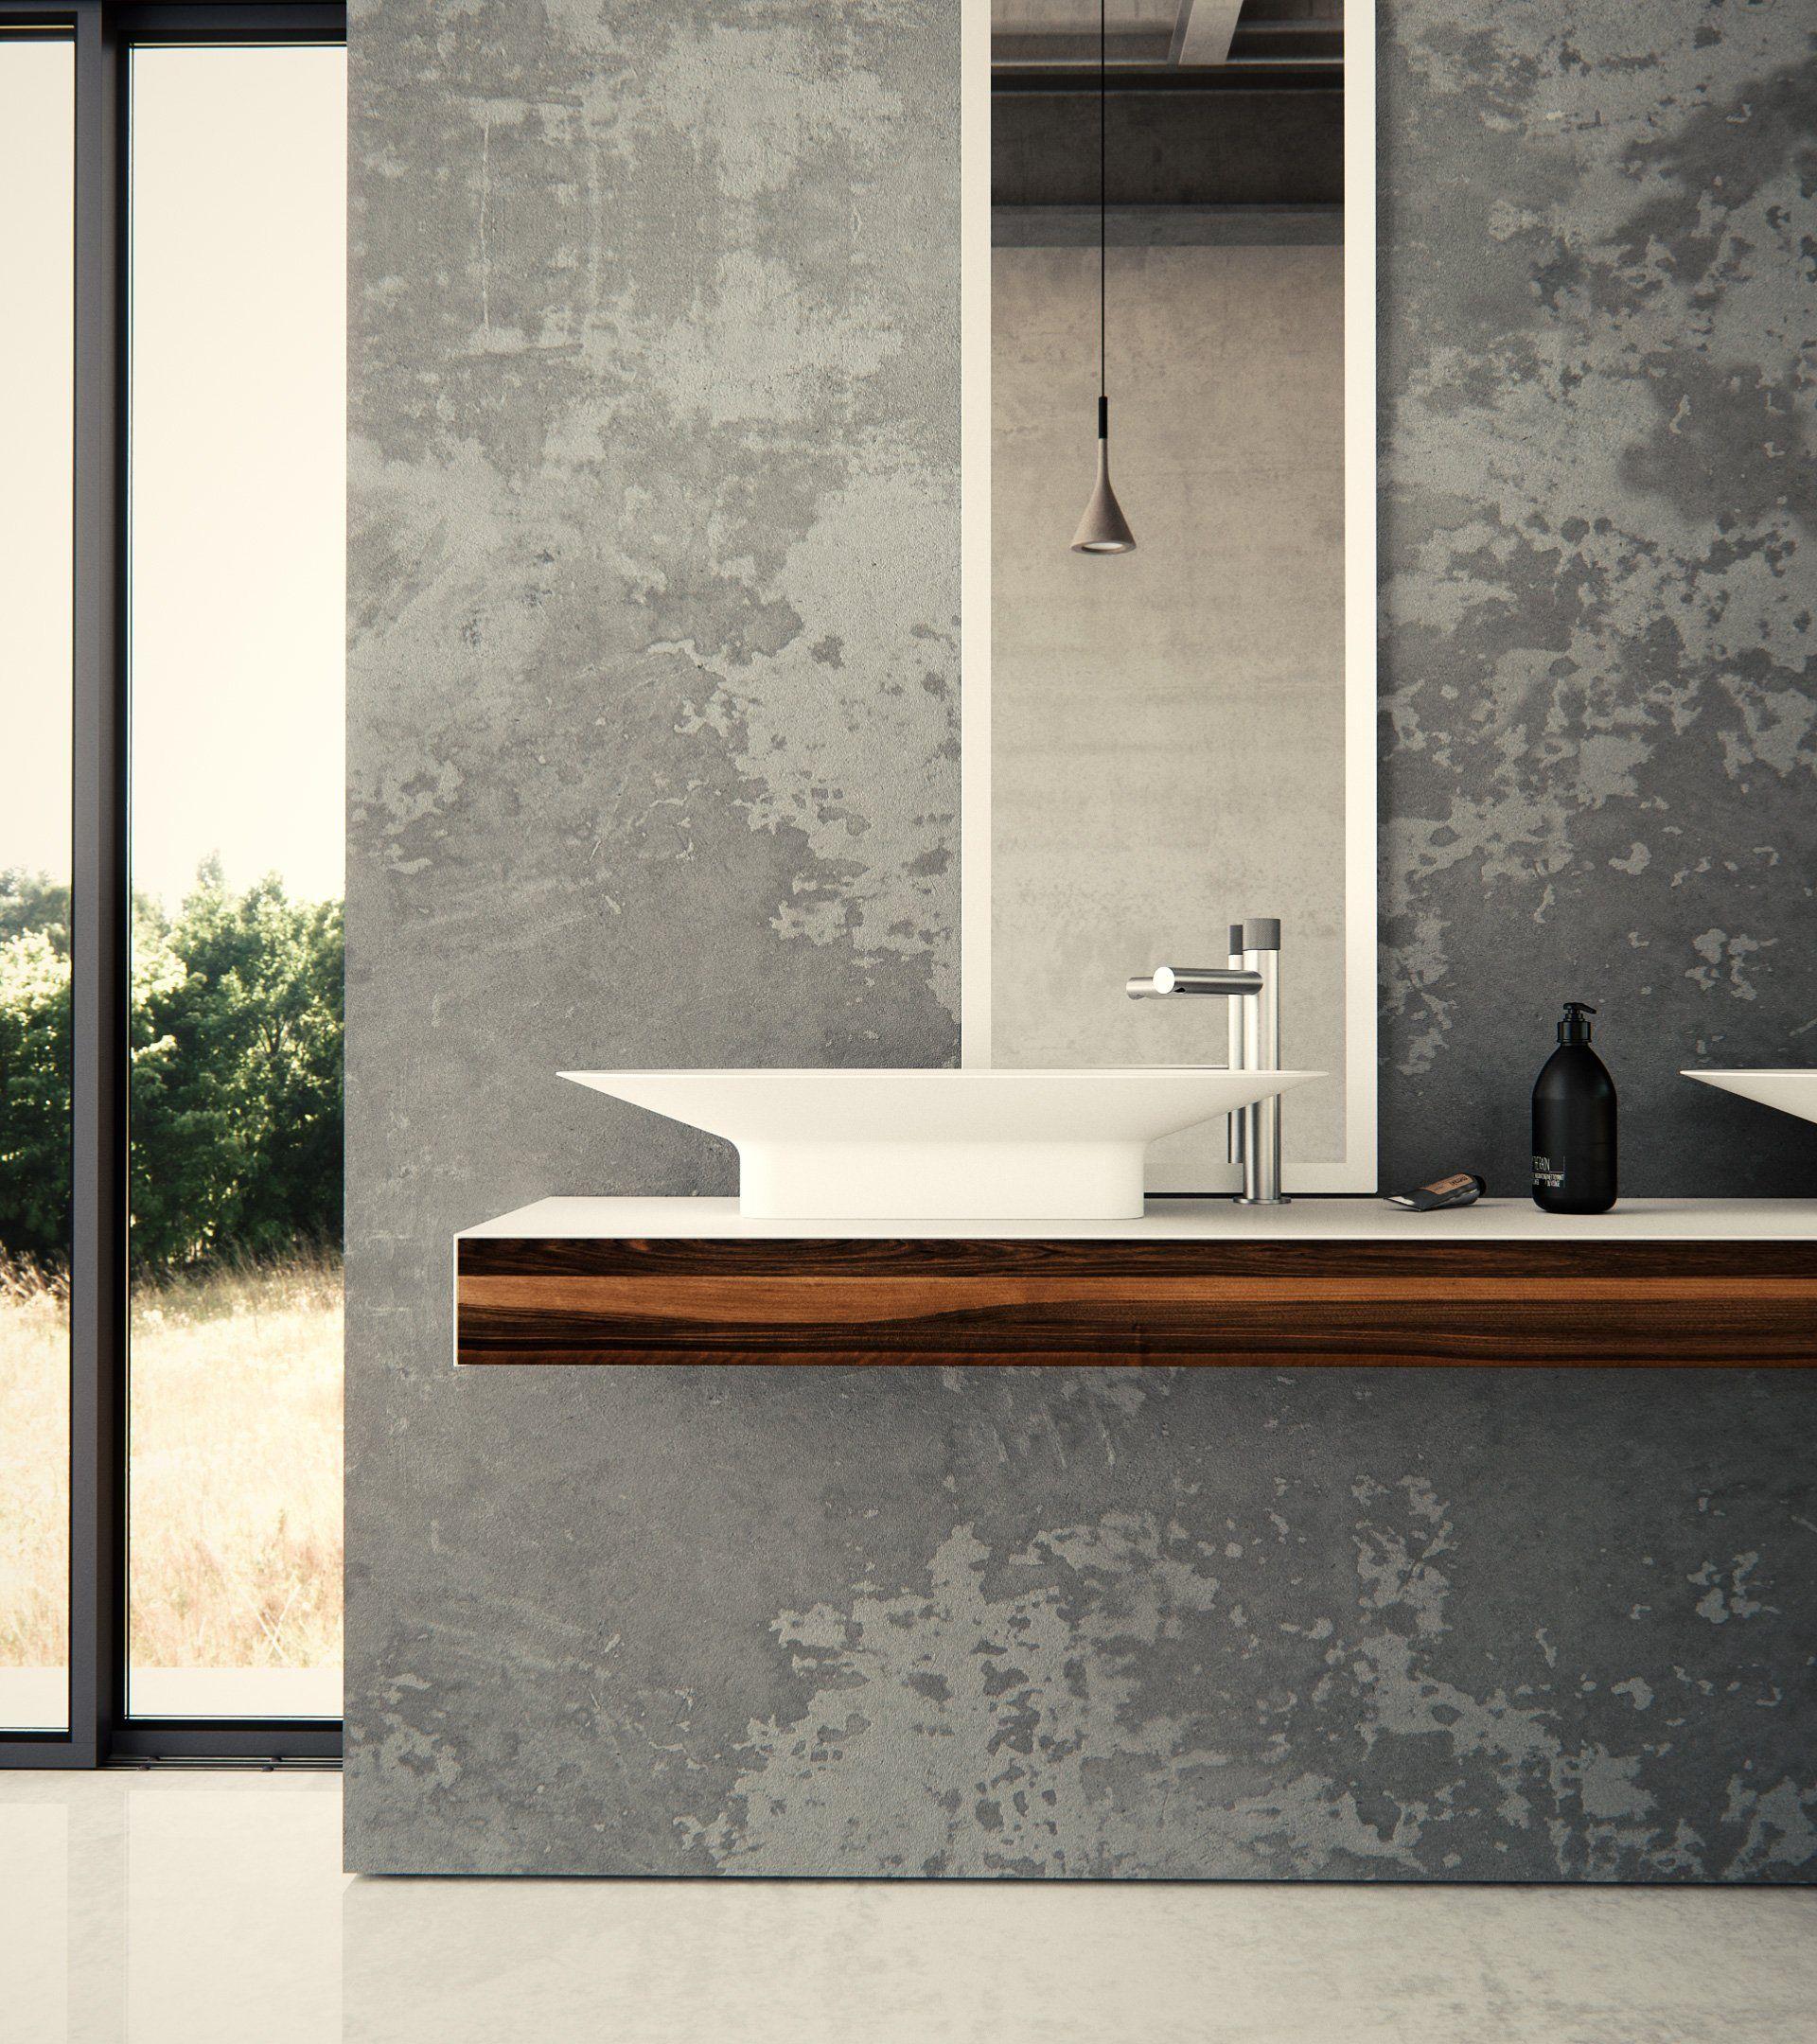 Benitier 01 Contemporary Bathroom Sinks Minimalist Bathroom